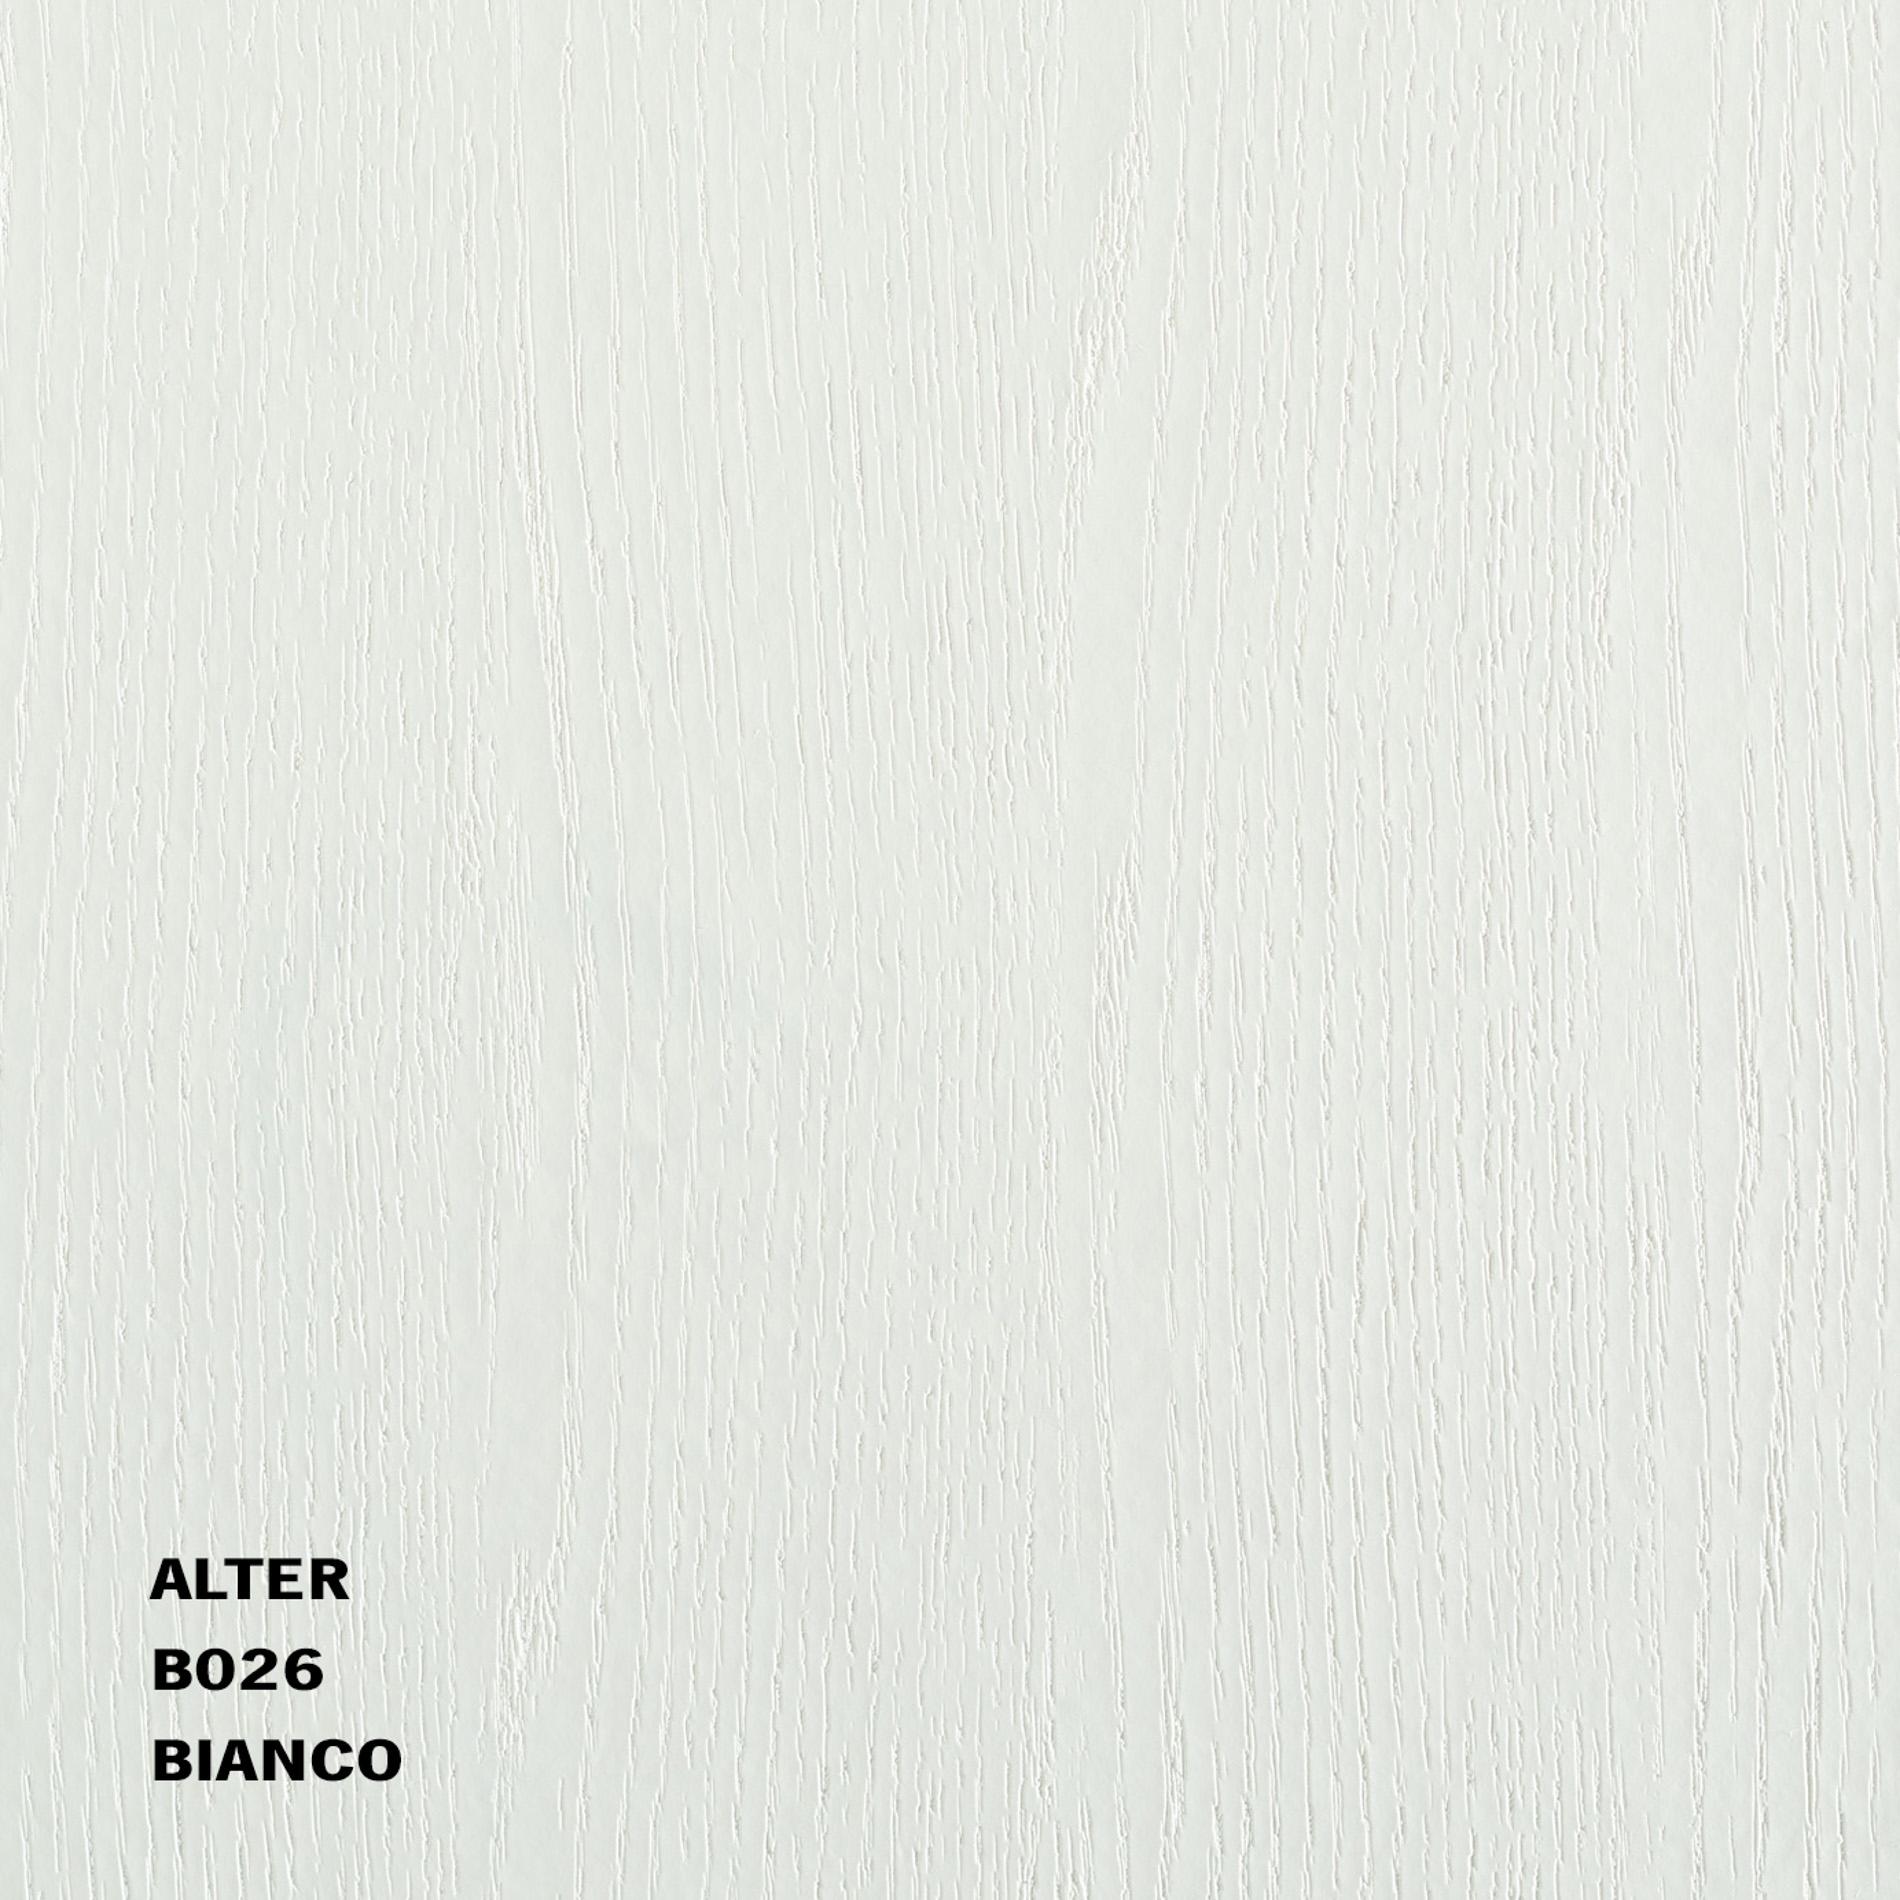 Alter_b026